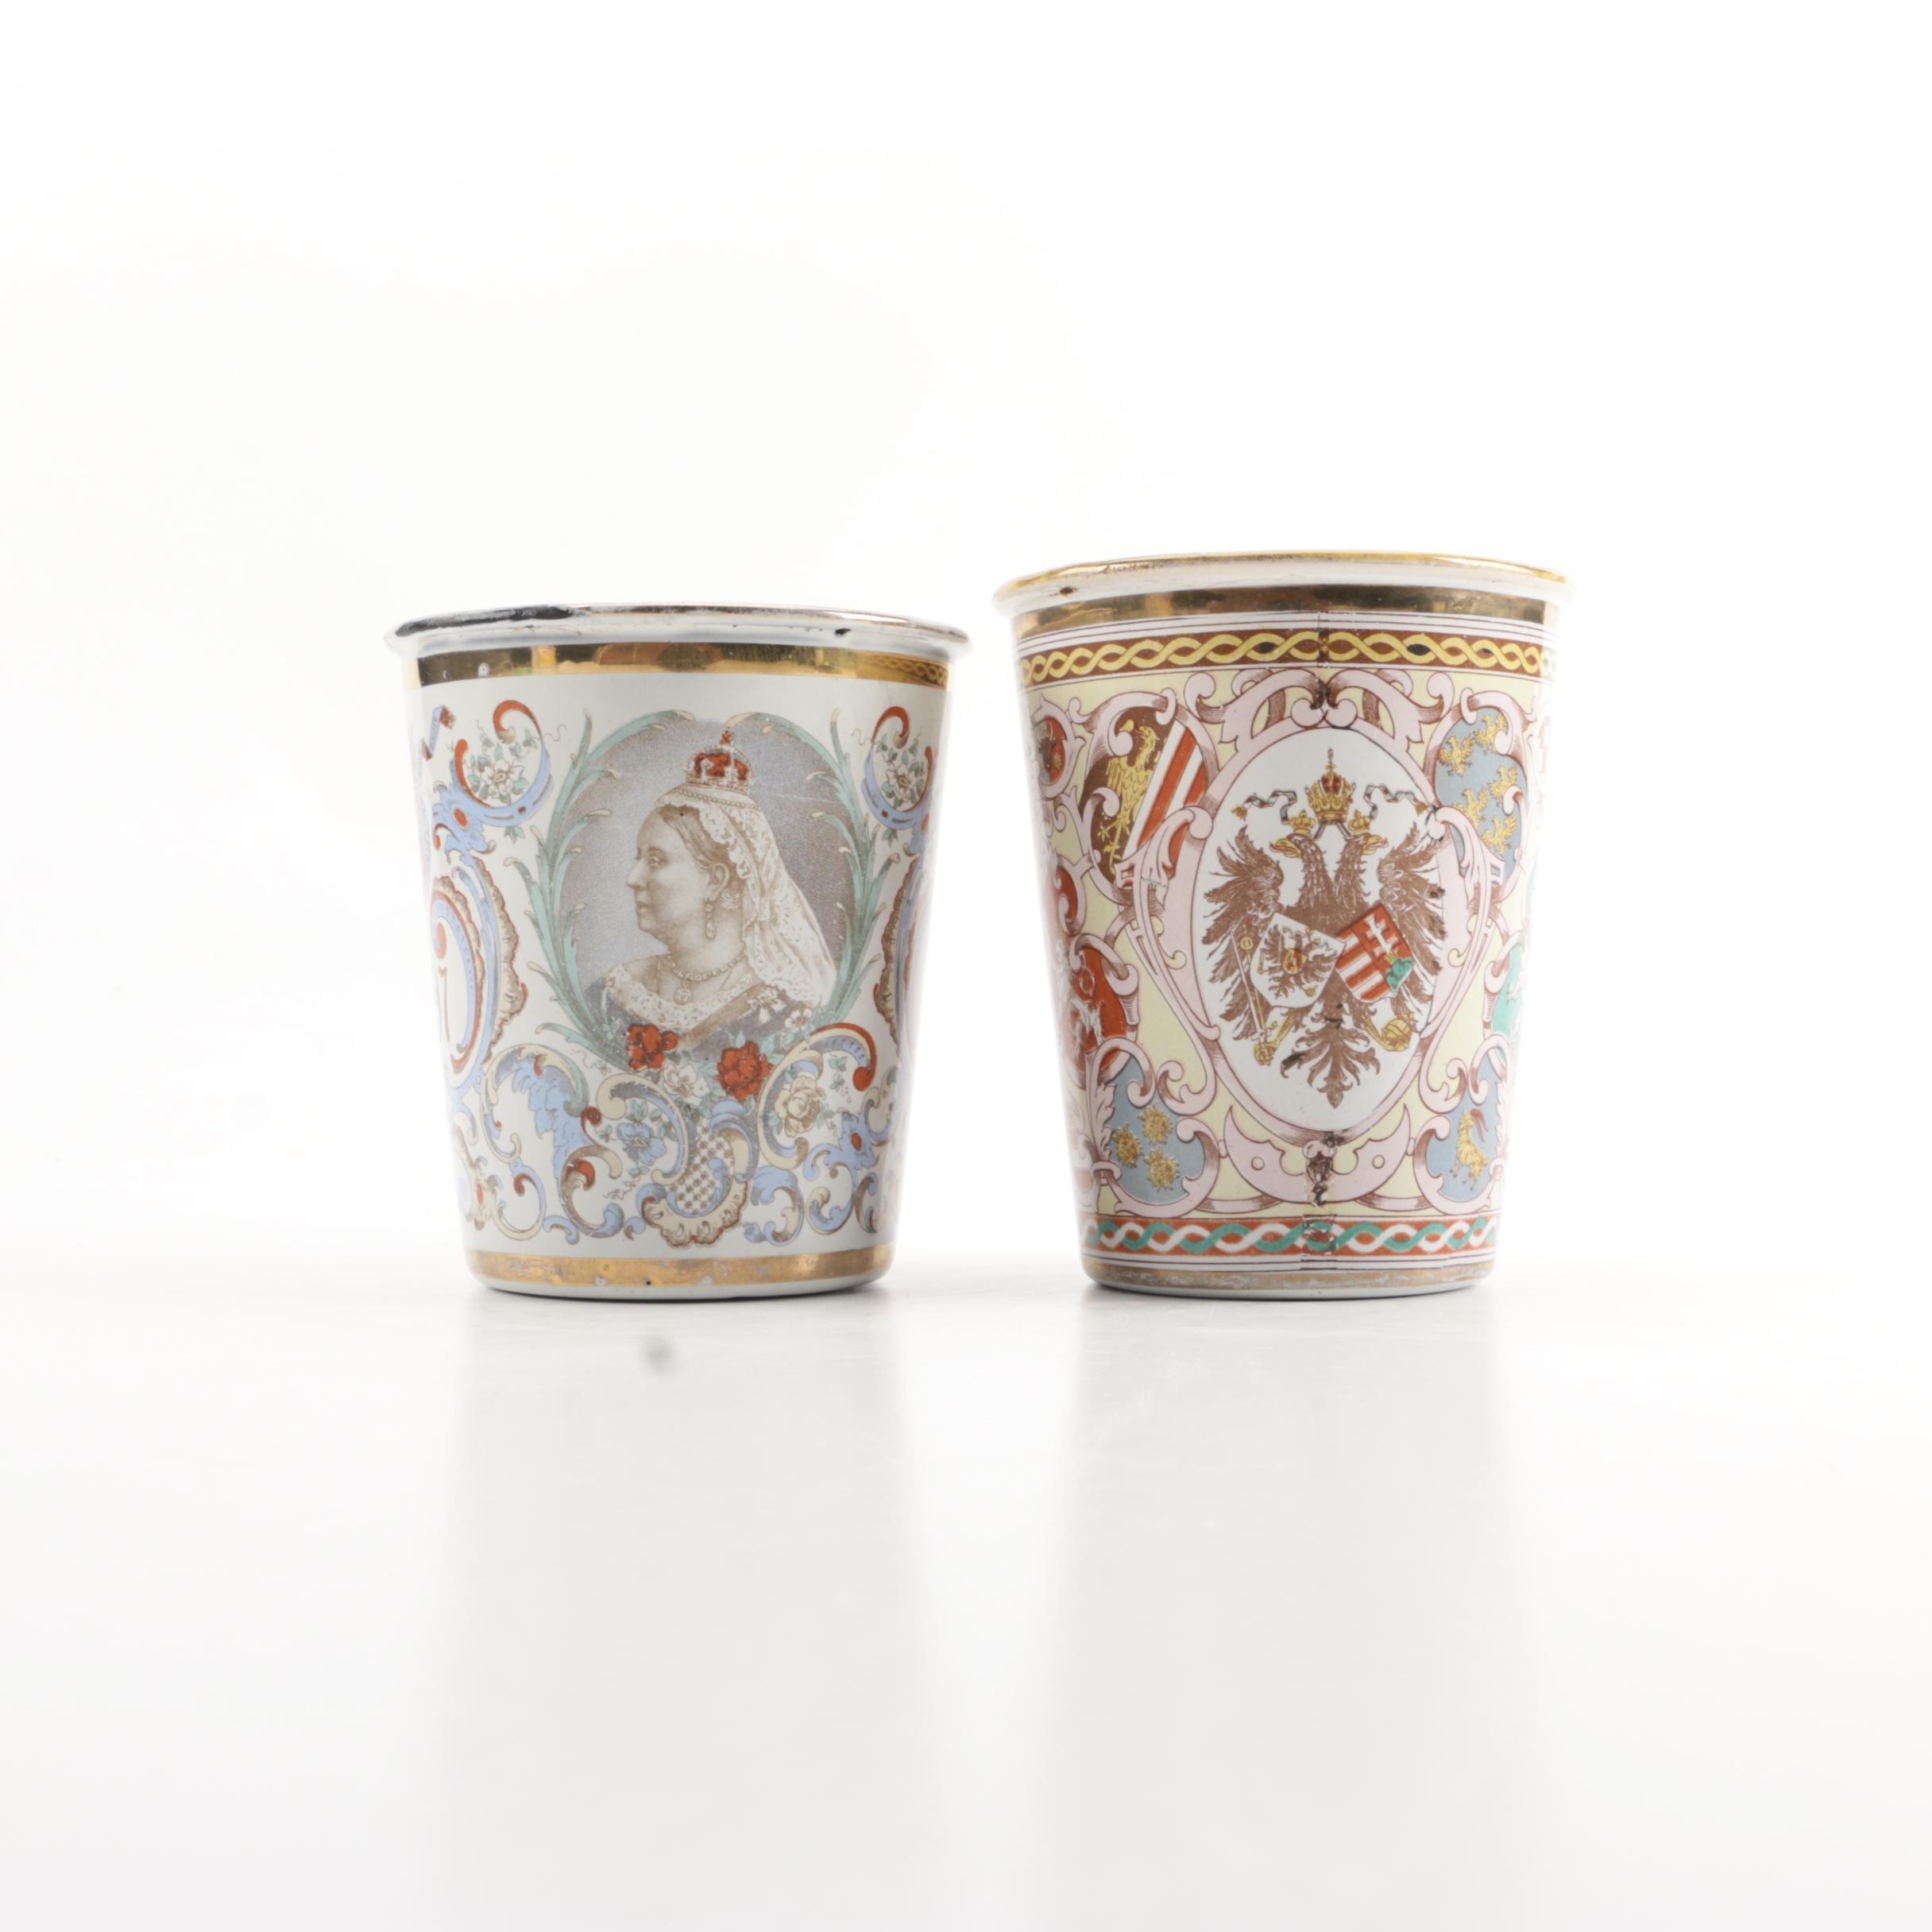 Antique Commemorative Cups Including Queen Victoria's Diamond Jubilee